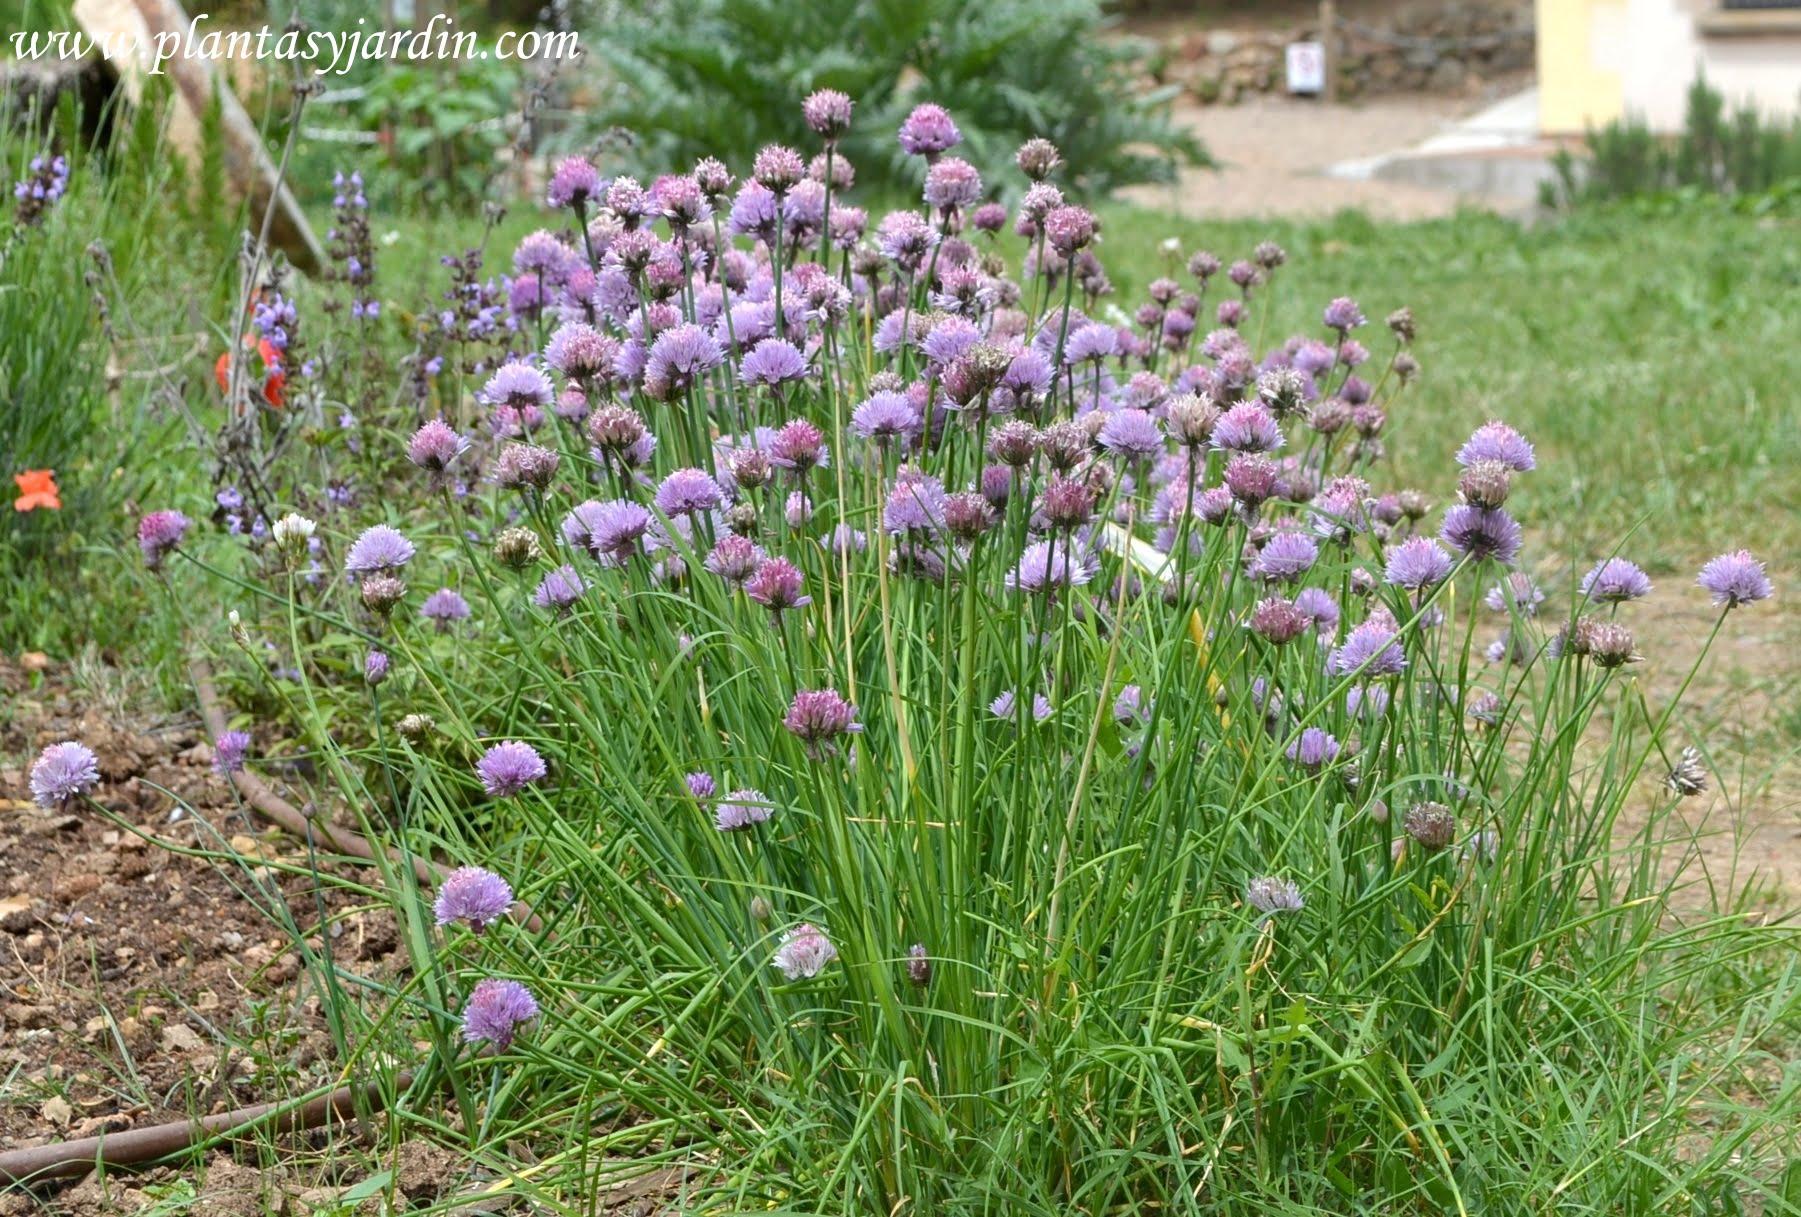 Allium schoenoprasum-ciboulette-cebollino, florecido en verano